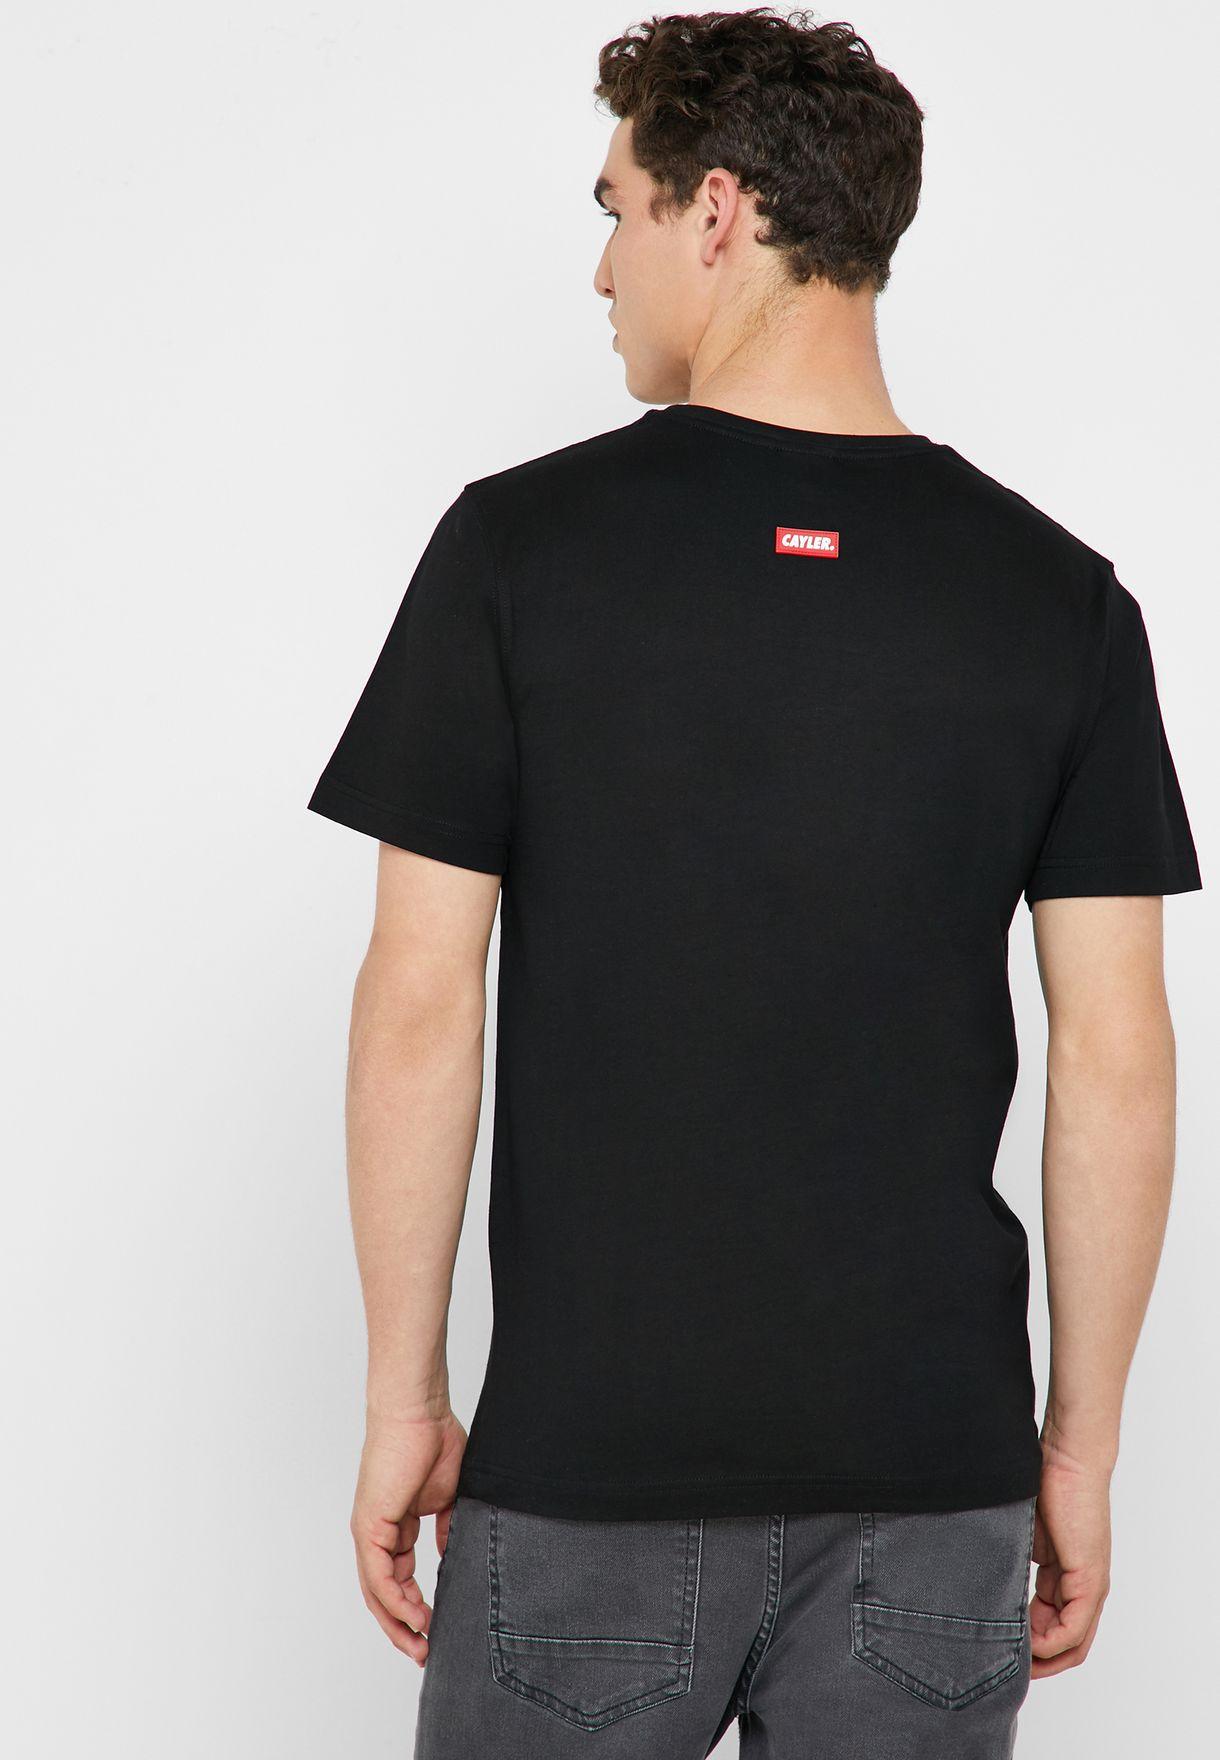 Jay Trust T-Shirt